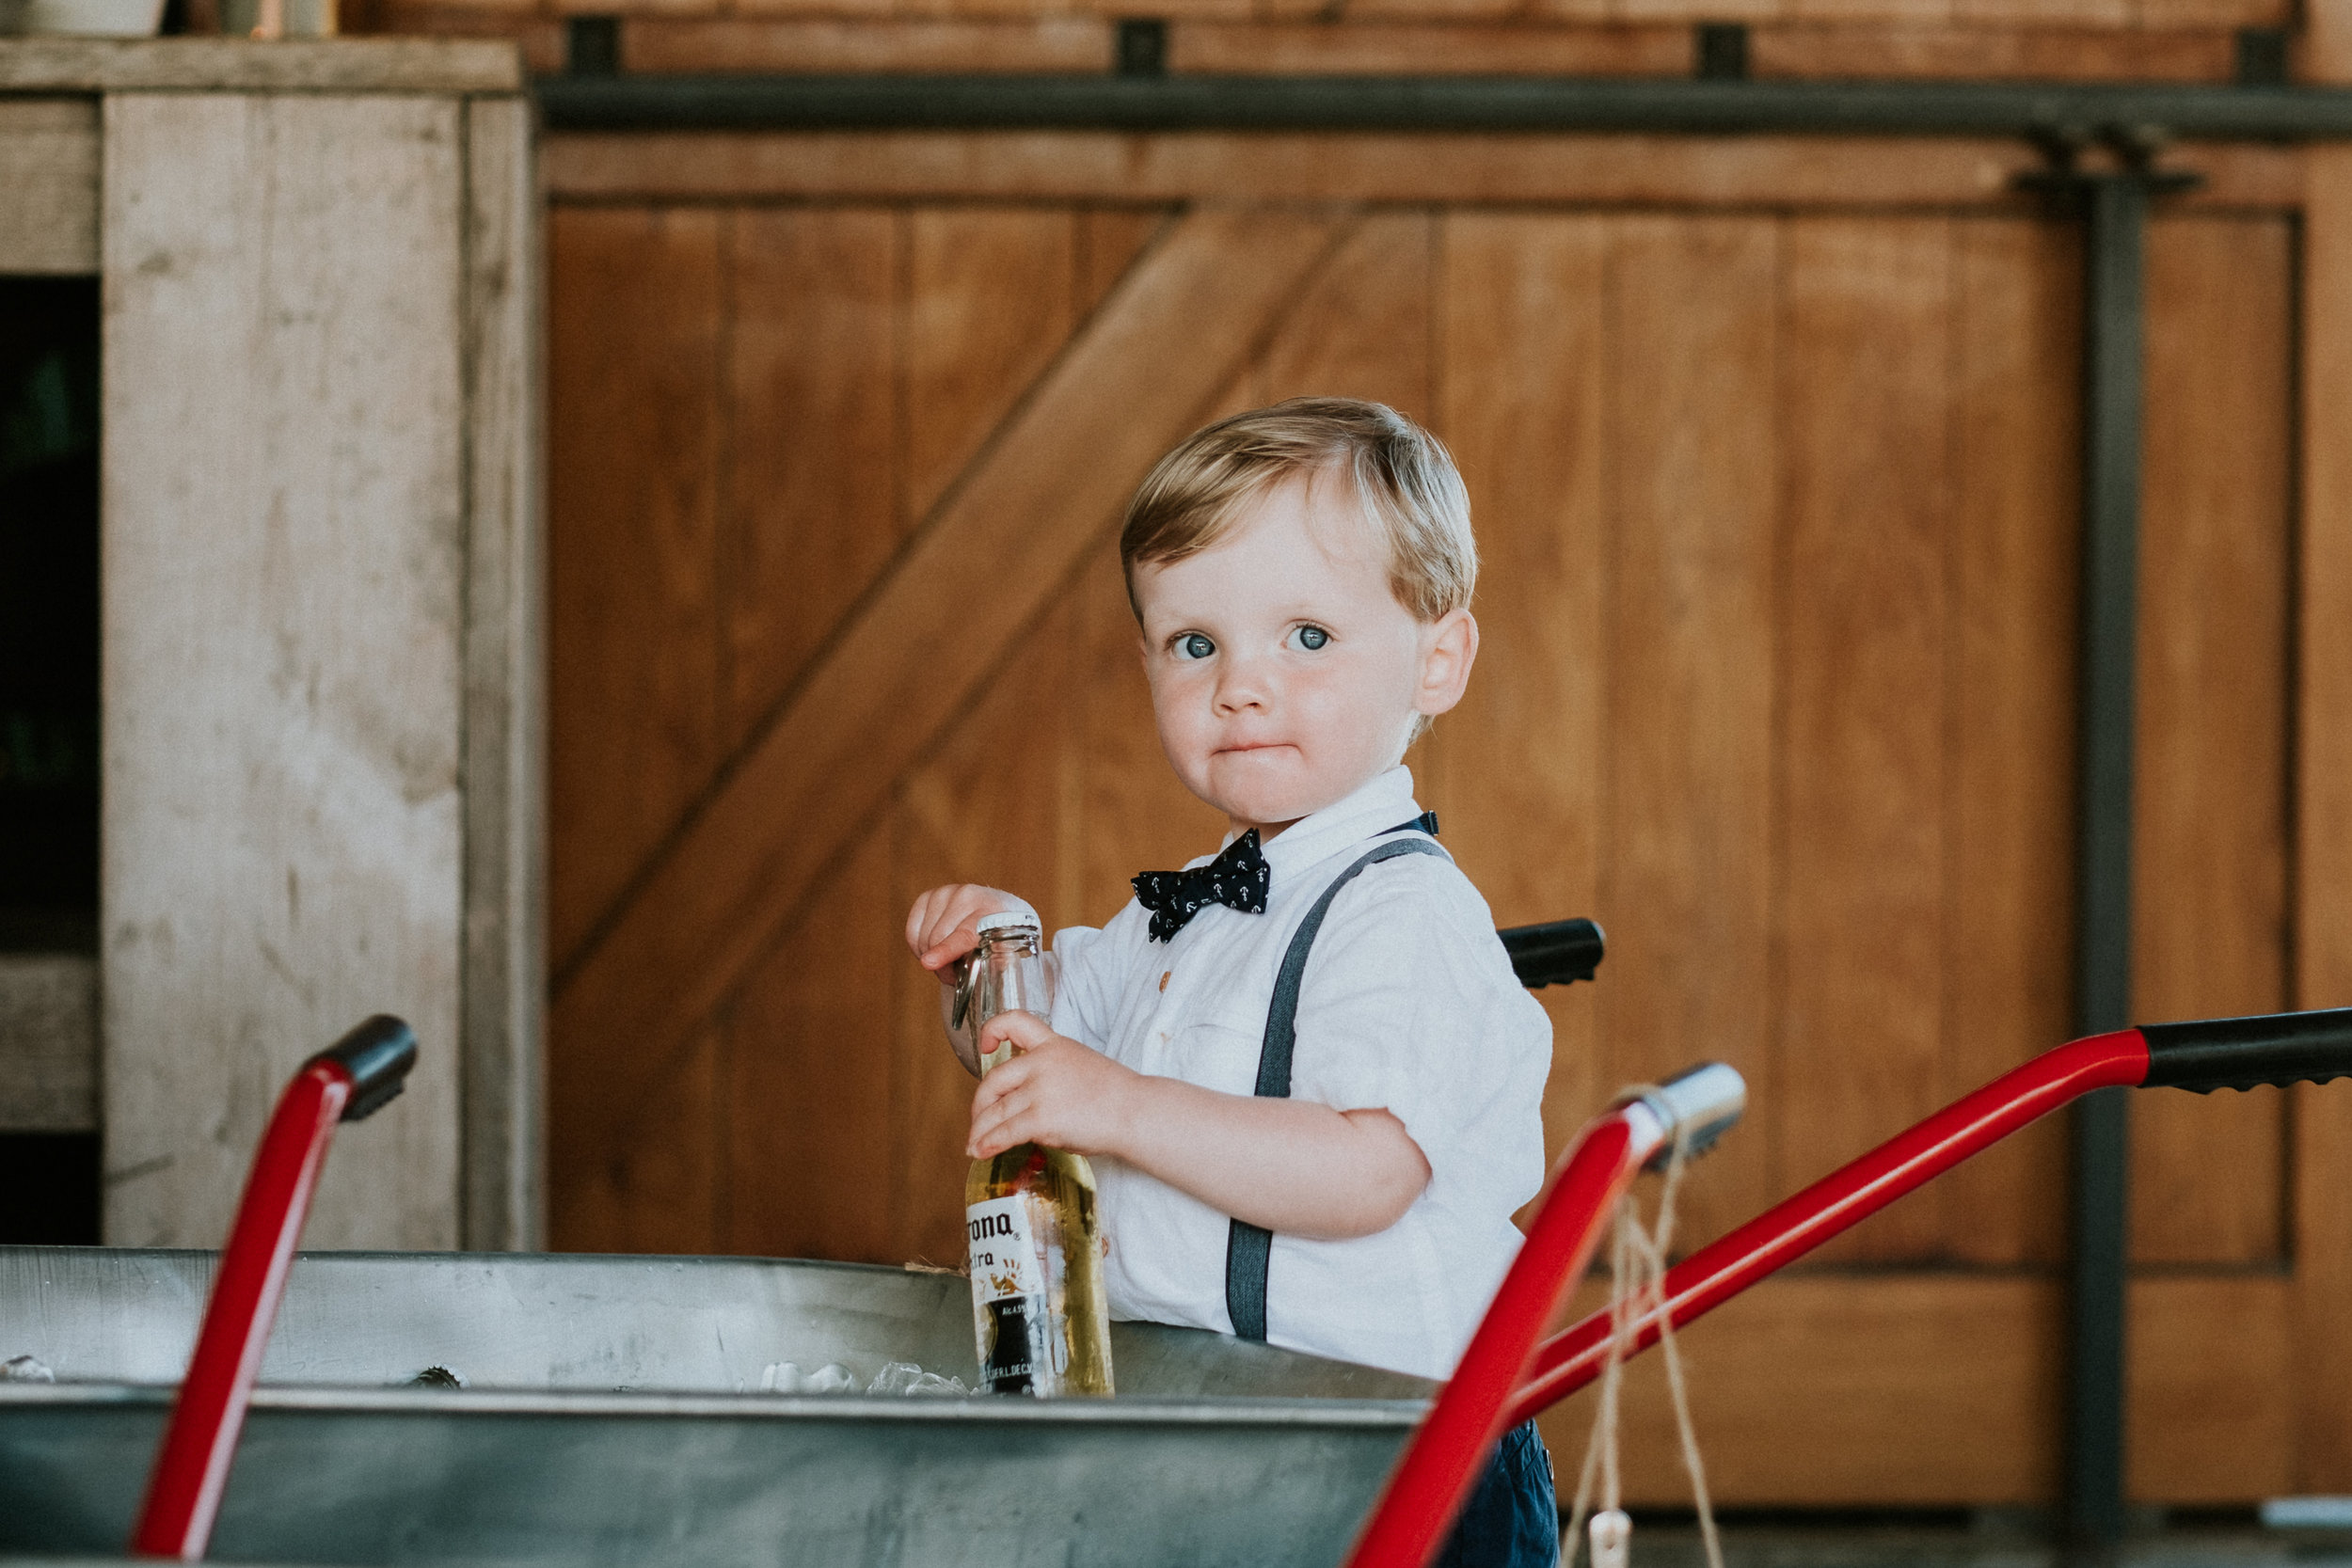 20 Southend Barns wedding photography Sussex creative fun joanna nicole photography3.jpg